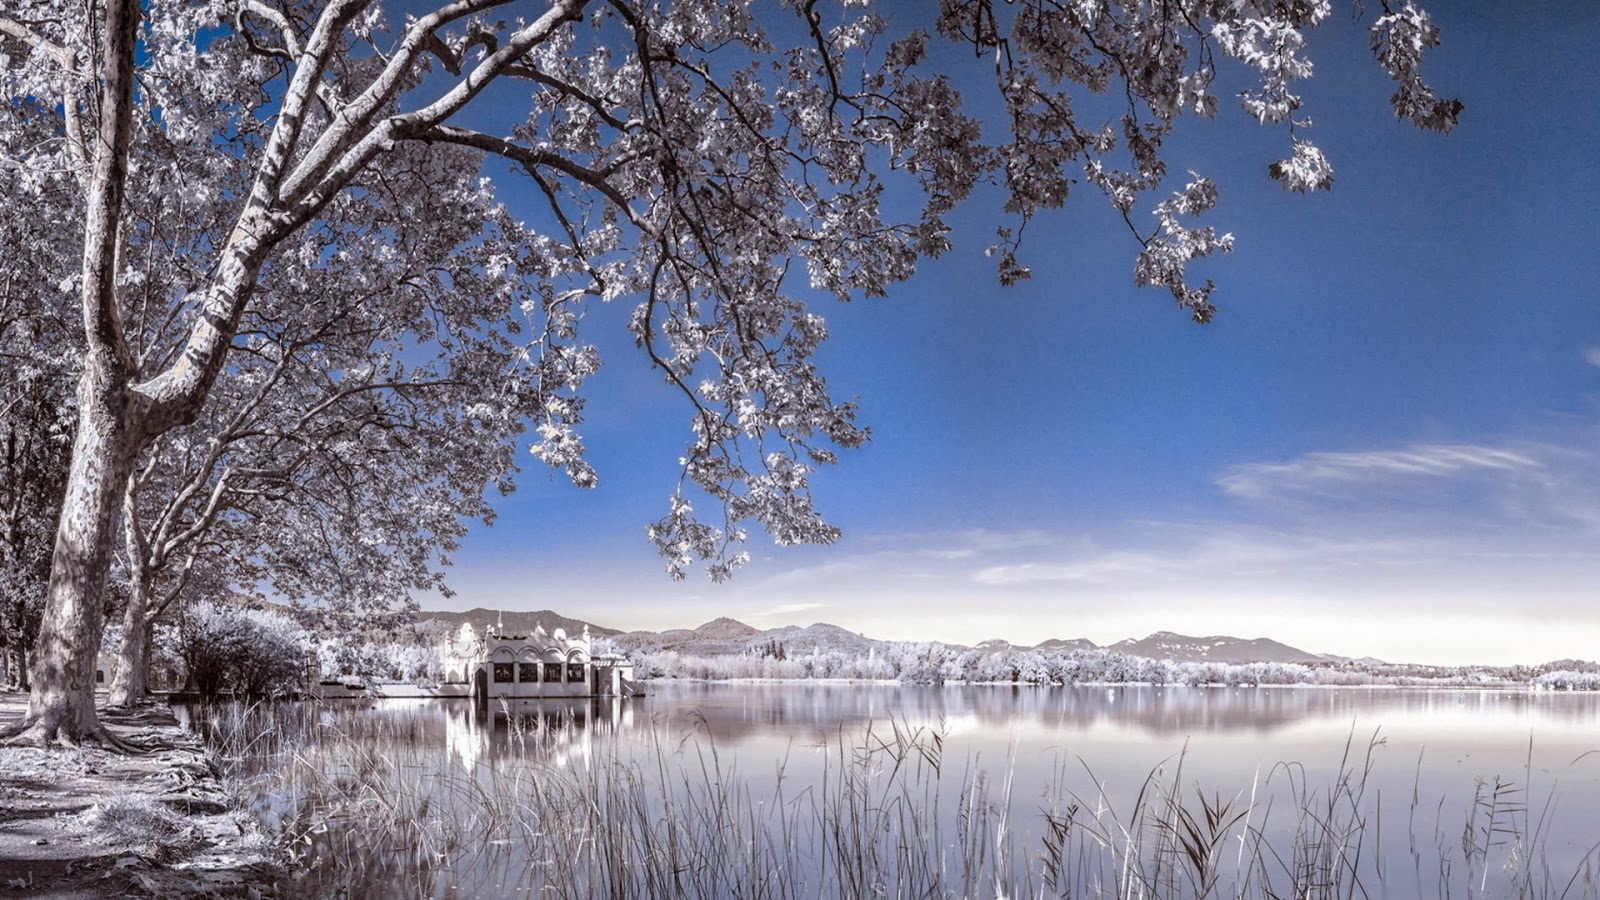 WinterScene Wallpaper Background Snow22jpg 1600x900